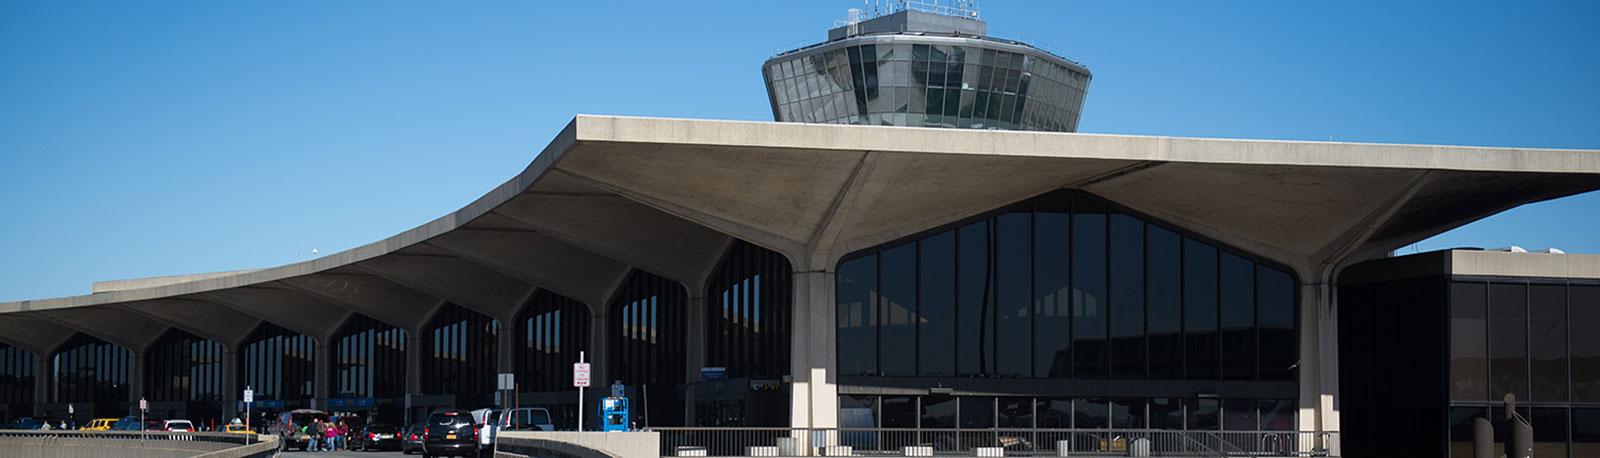 Newark Airport Parking Lots Hero